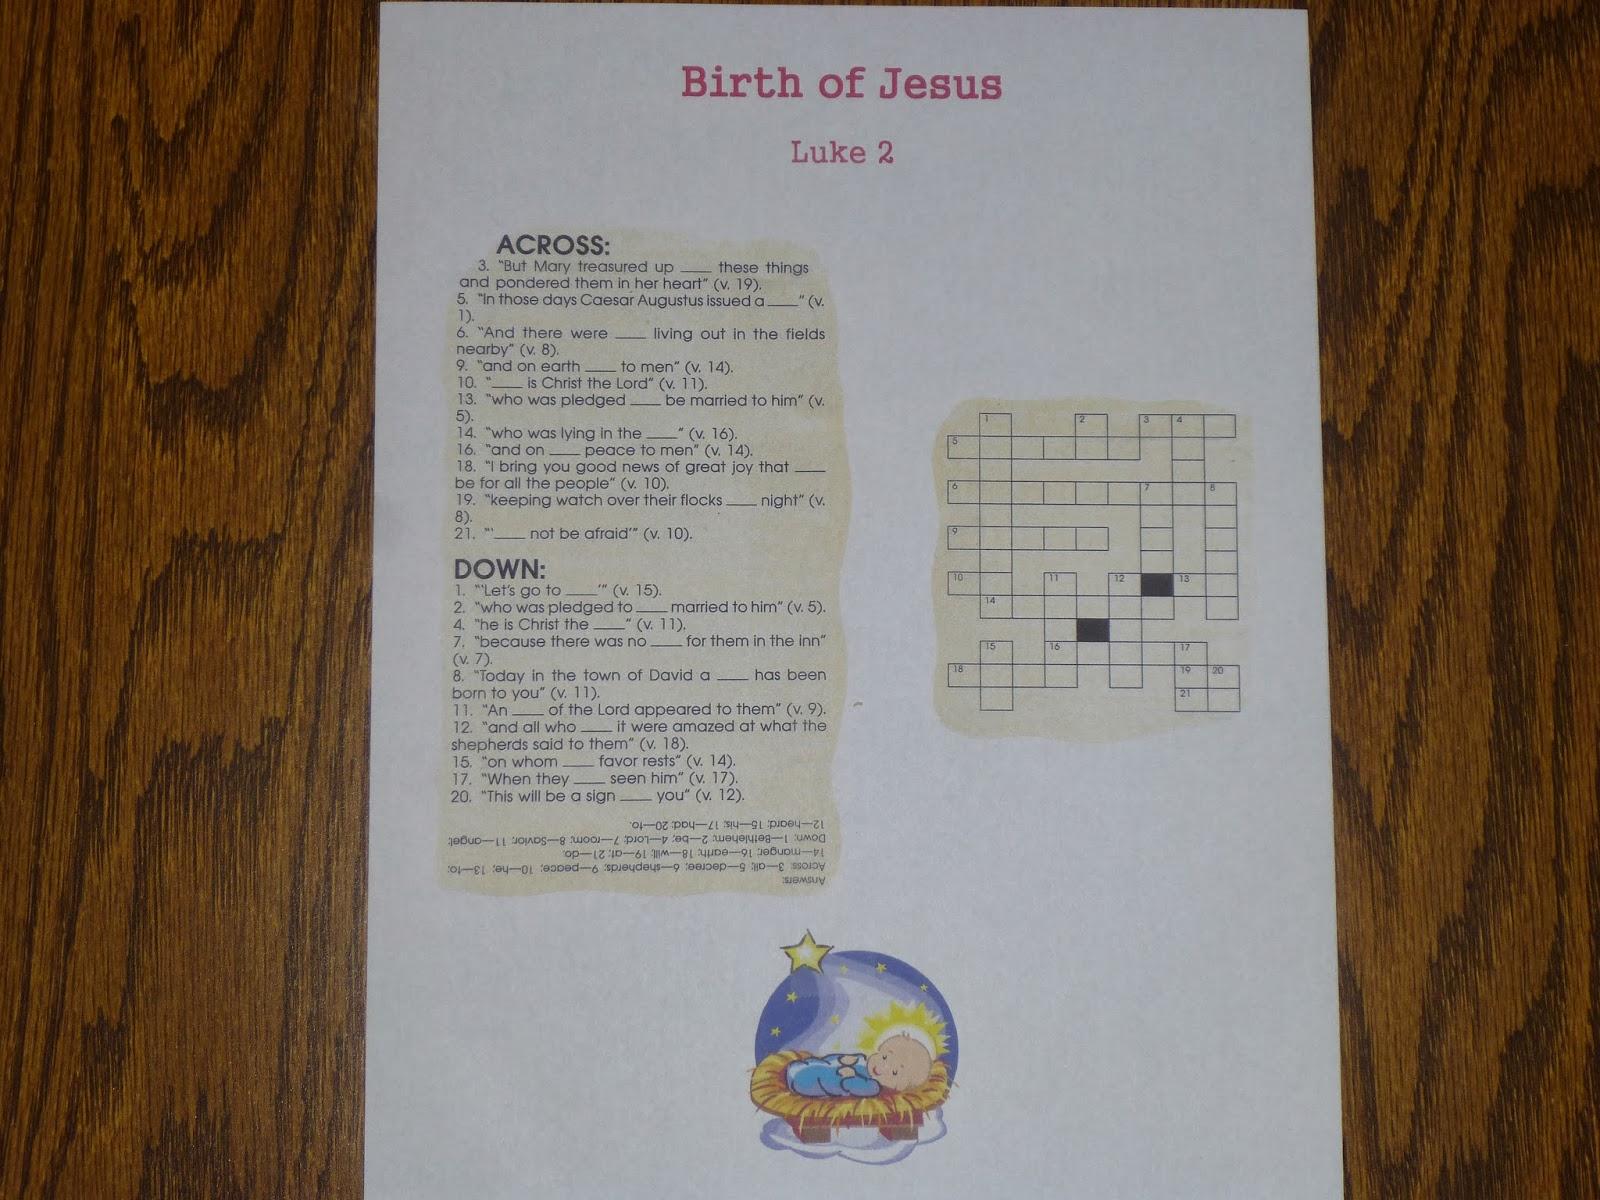 Ideas Unlimited: Birth Of Jesus Puzzle - Luke 2 (Niv) - Printable Jesus Puzzle